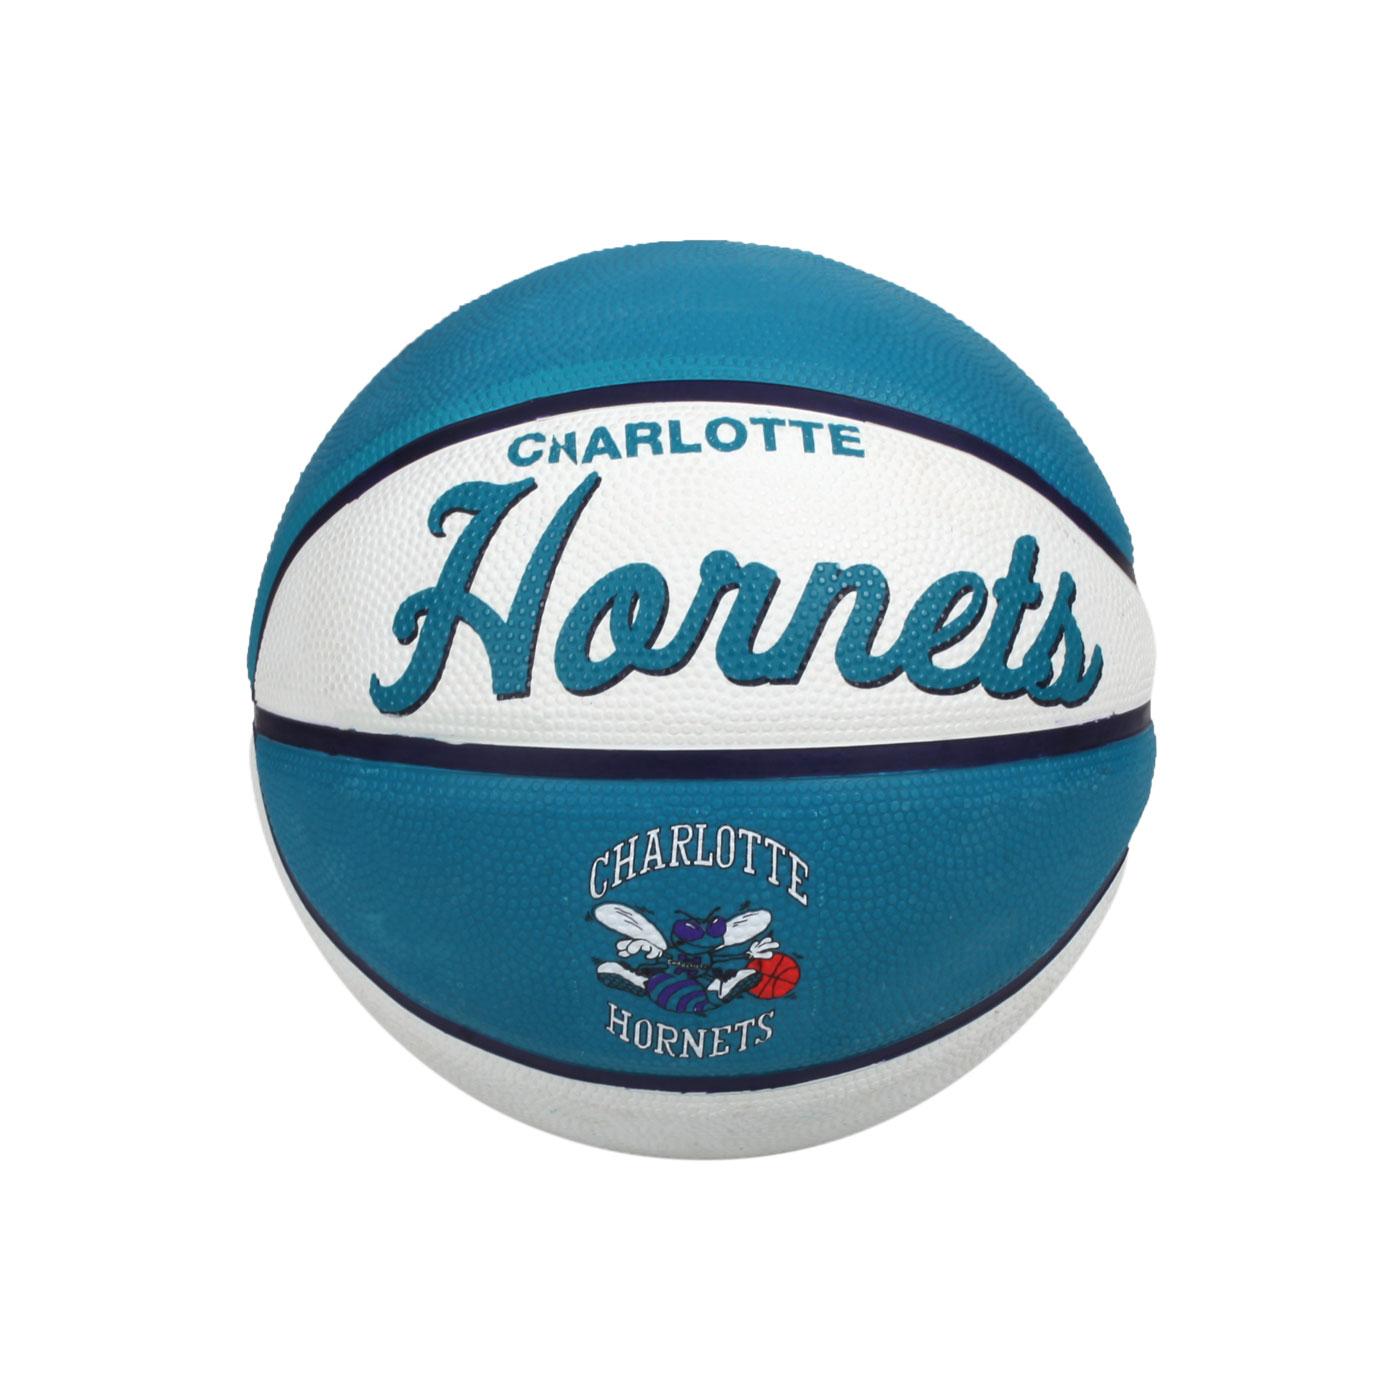 WILSON NBA隊徽系列橡膠籃球-復古黃蜂隊#3 WTB3200XBCHA - 藍綠白